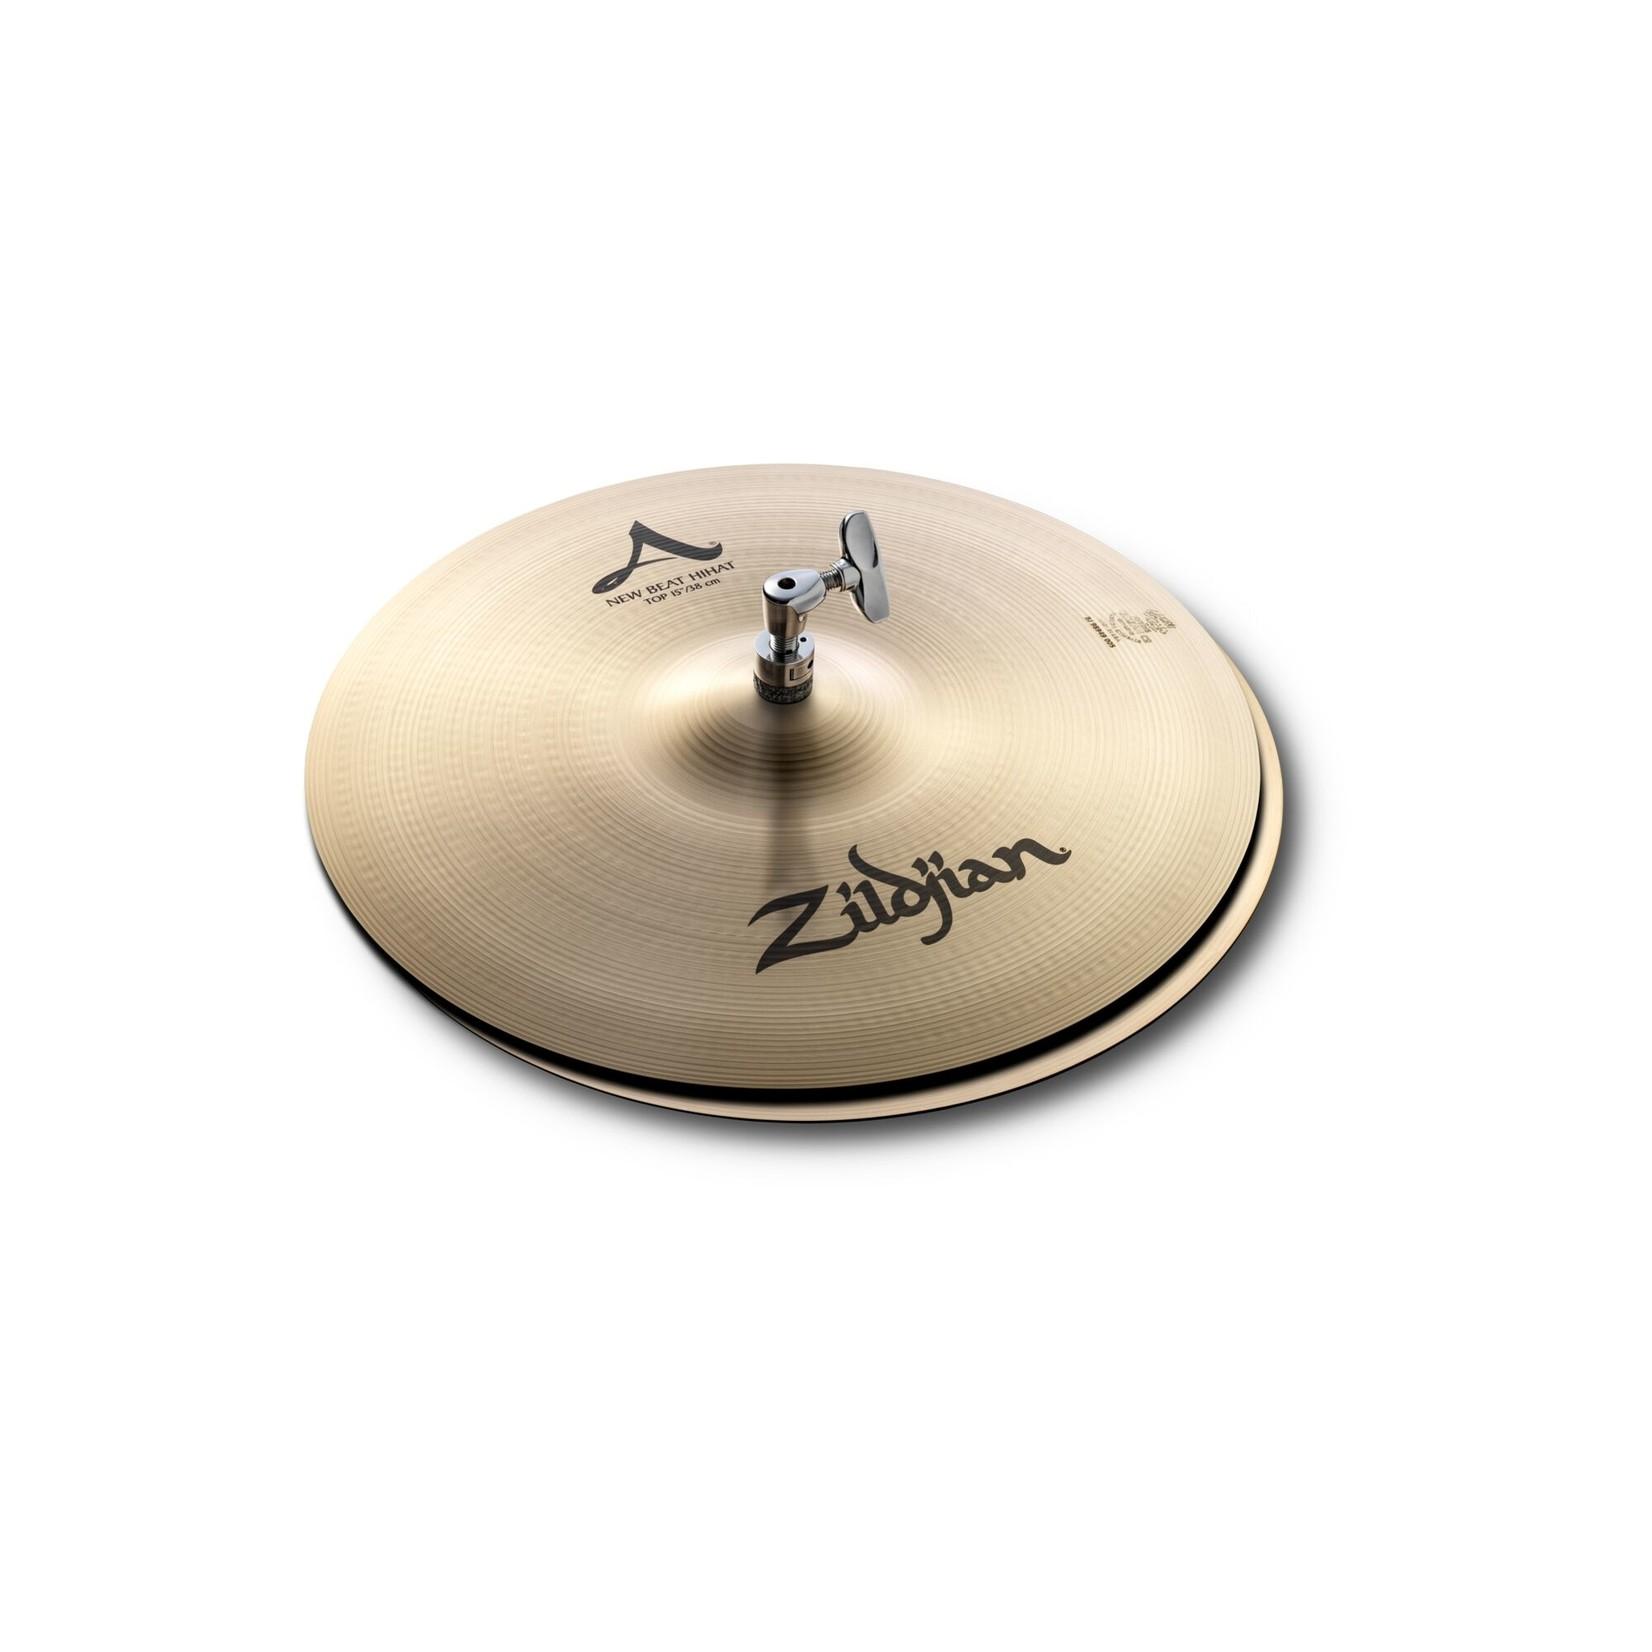 "Zildjian Zildjian 15"" A Zildjian New Beat HiHats - Pair"